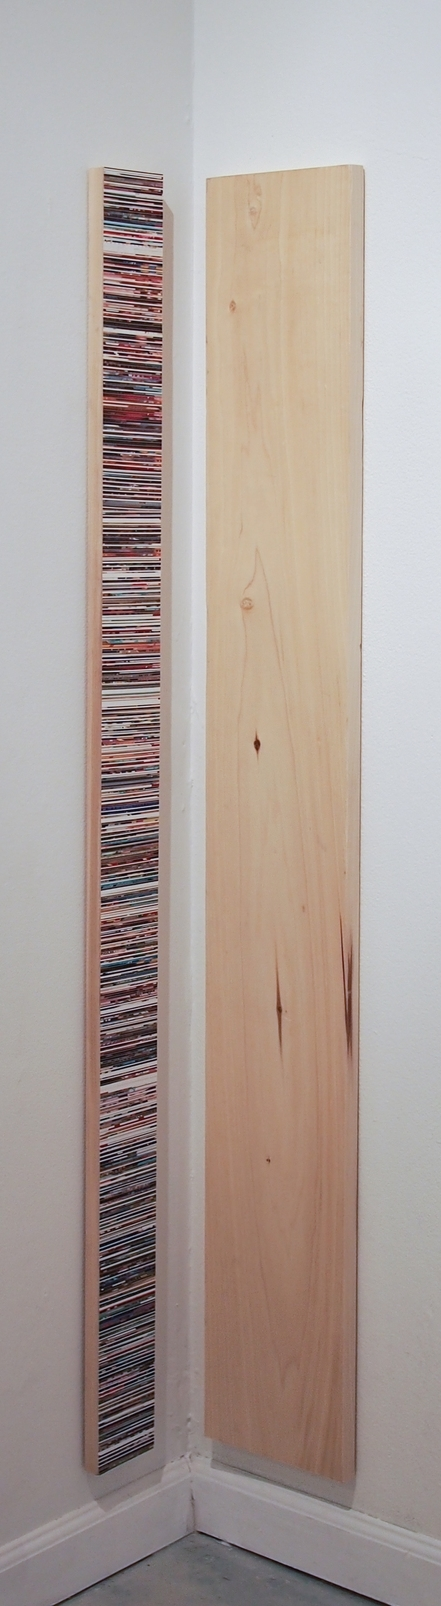 """Chub, Chub""  2014  Gloss gel medium, photo clippings on wood"